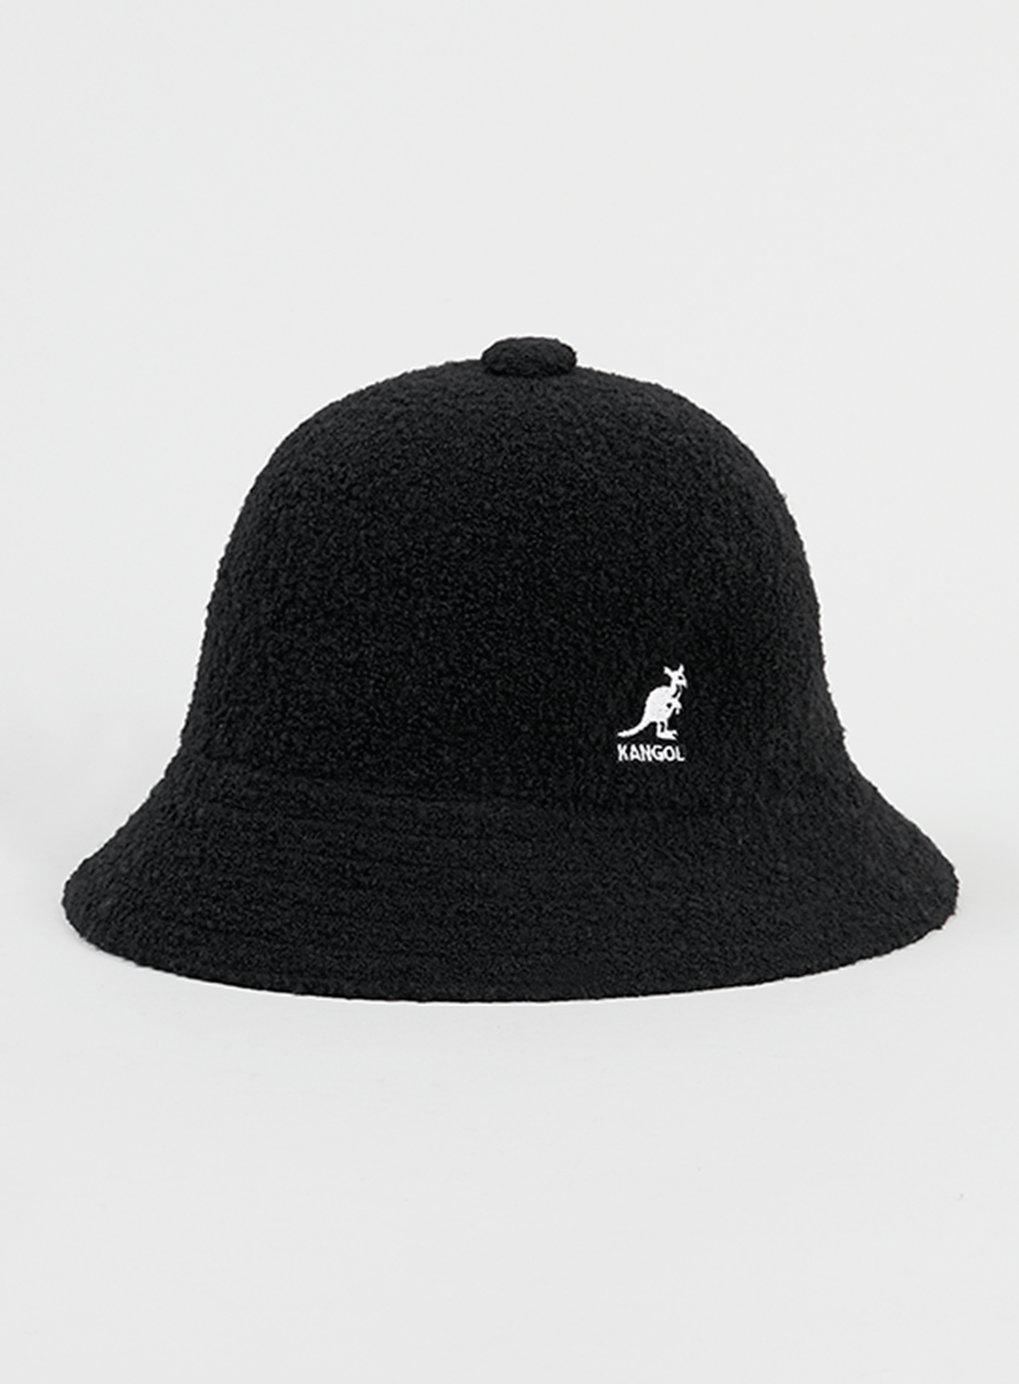 Topman Black Kangol Textured Bucket Hat in Black for Men ...